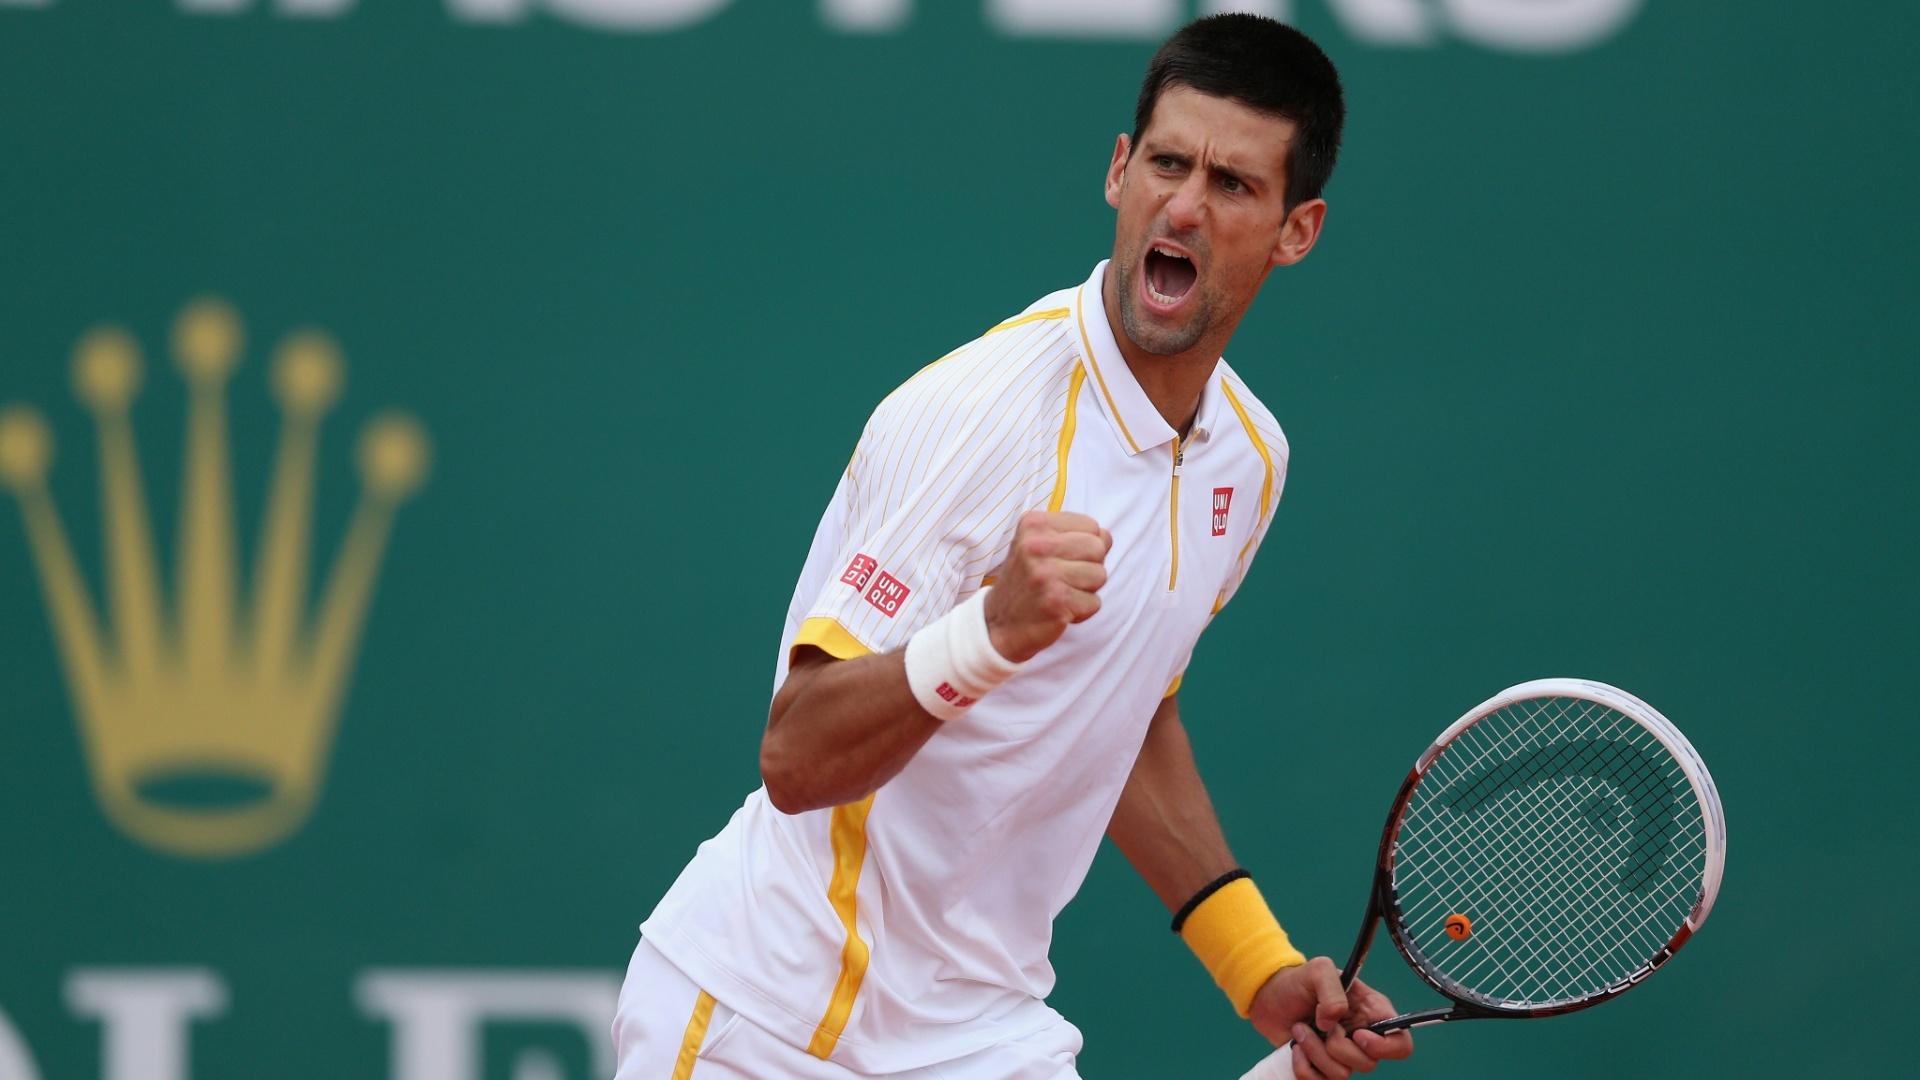 Djokovic, Kyrgios target Davis Cup final duel